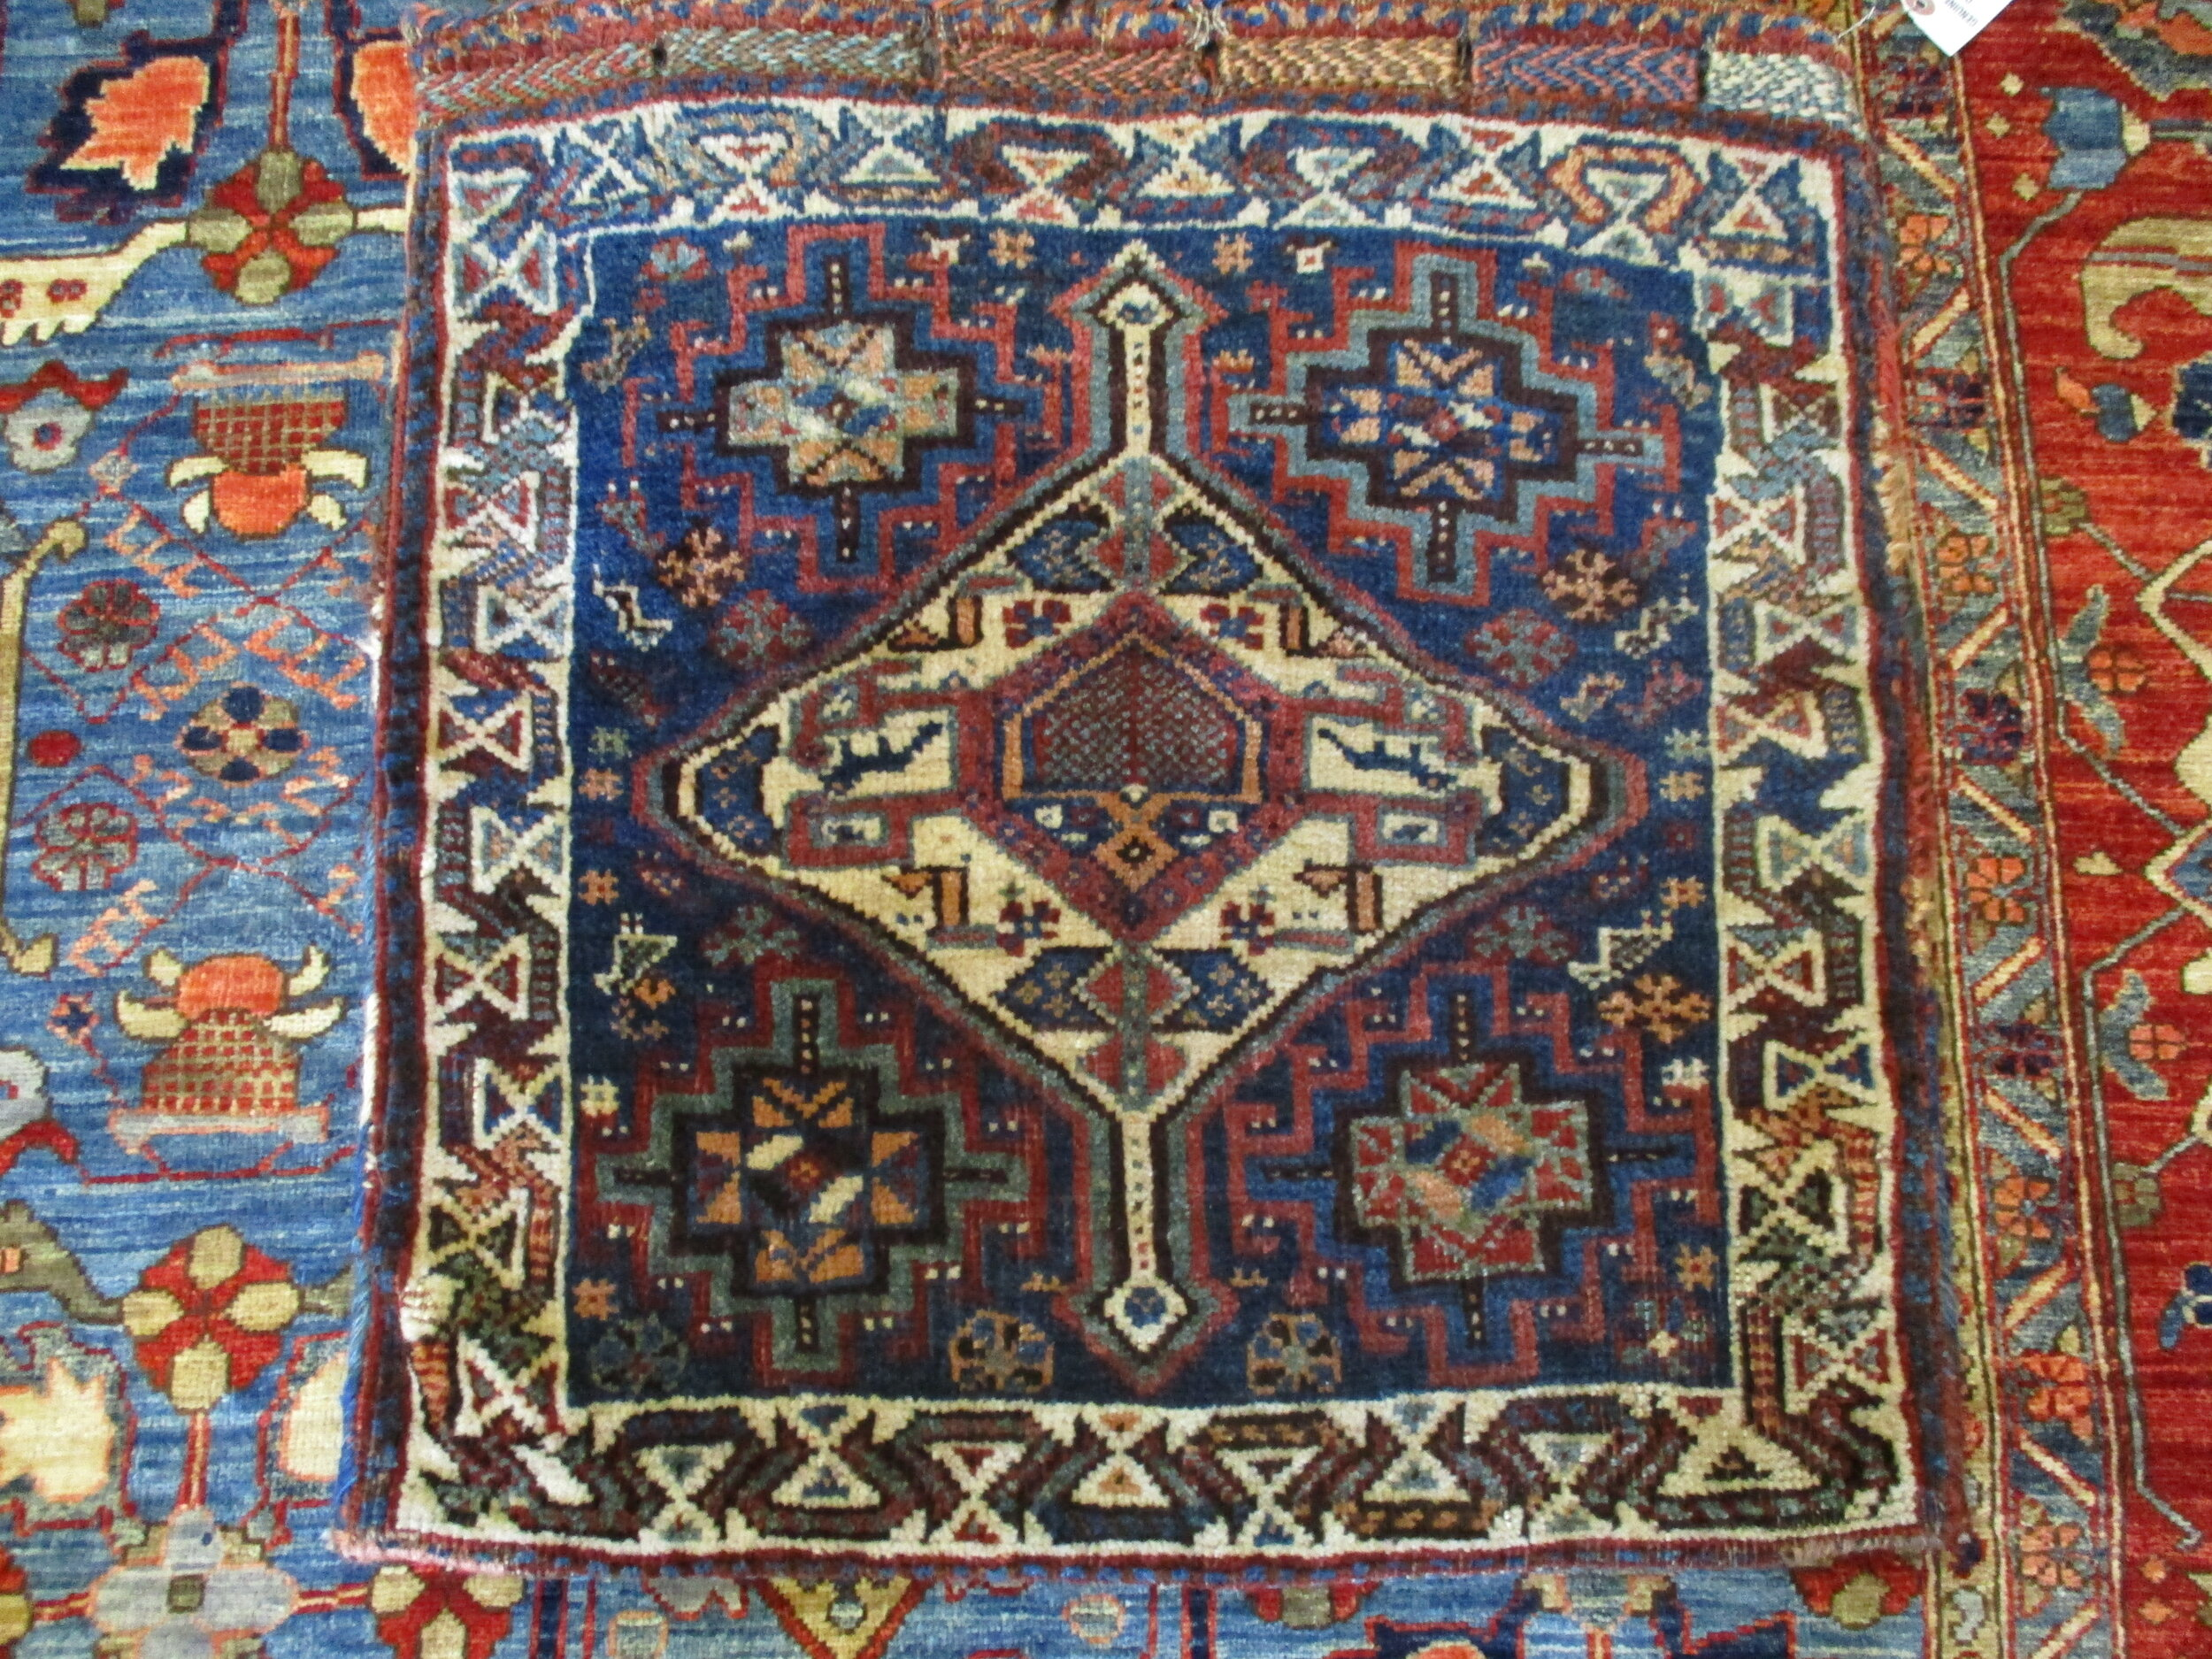 Antique Persian Saddlebag.